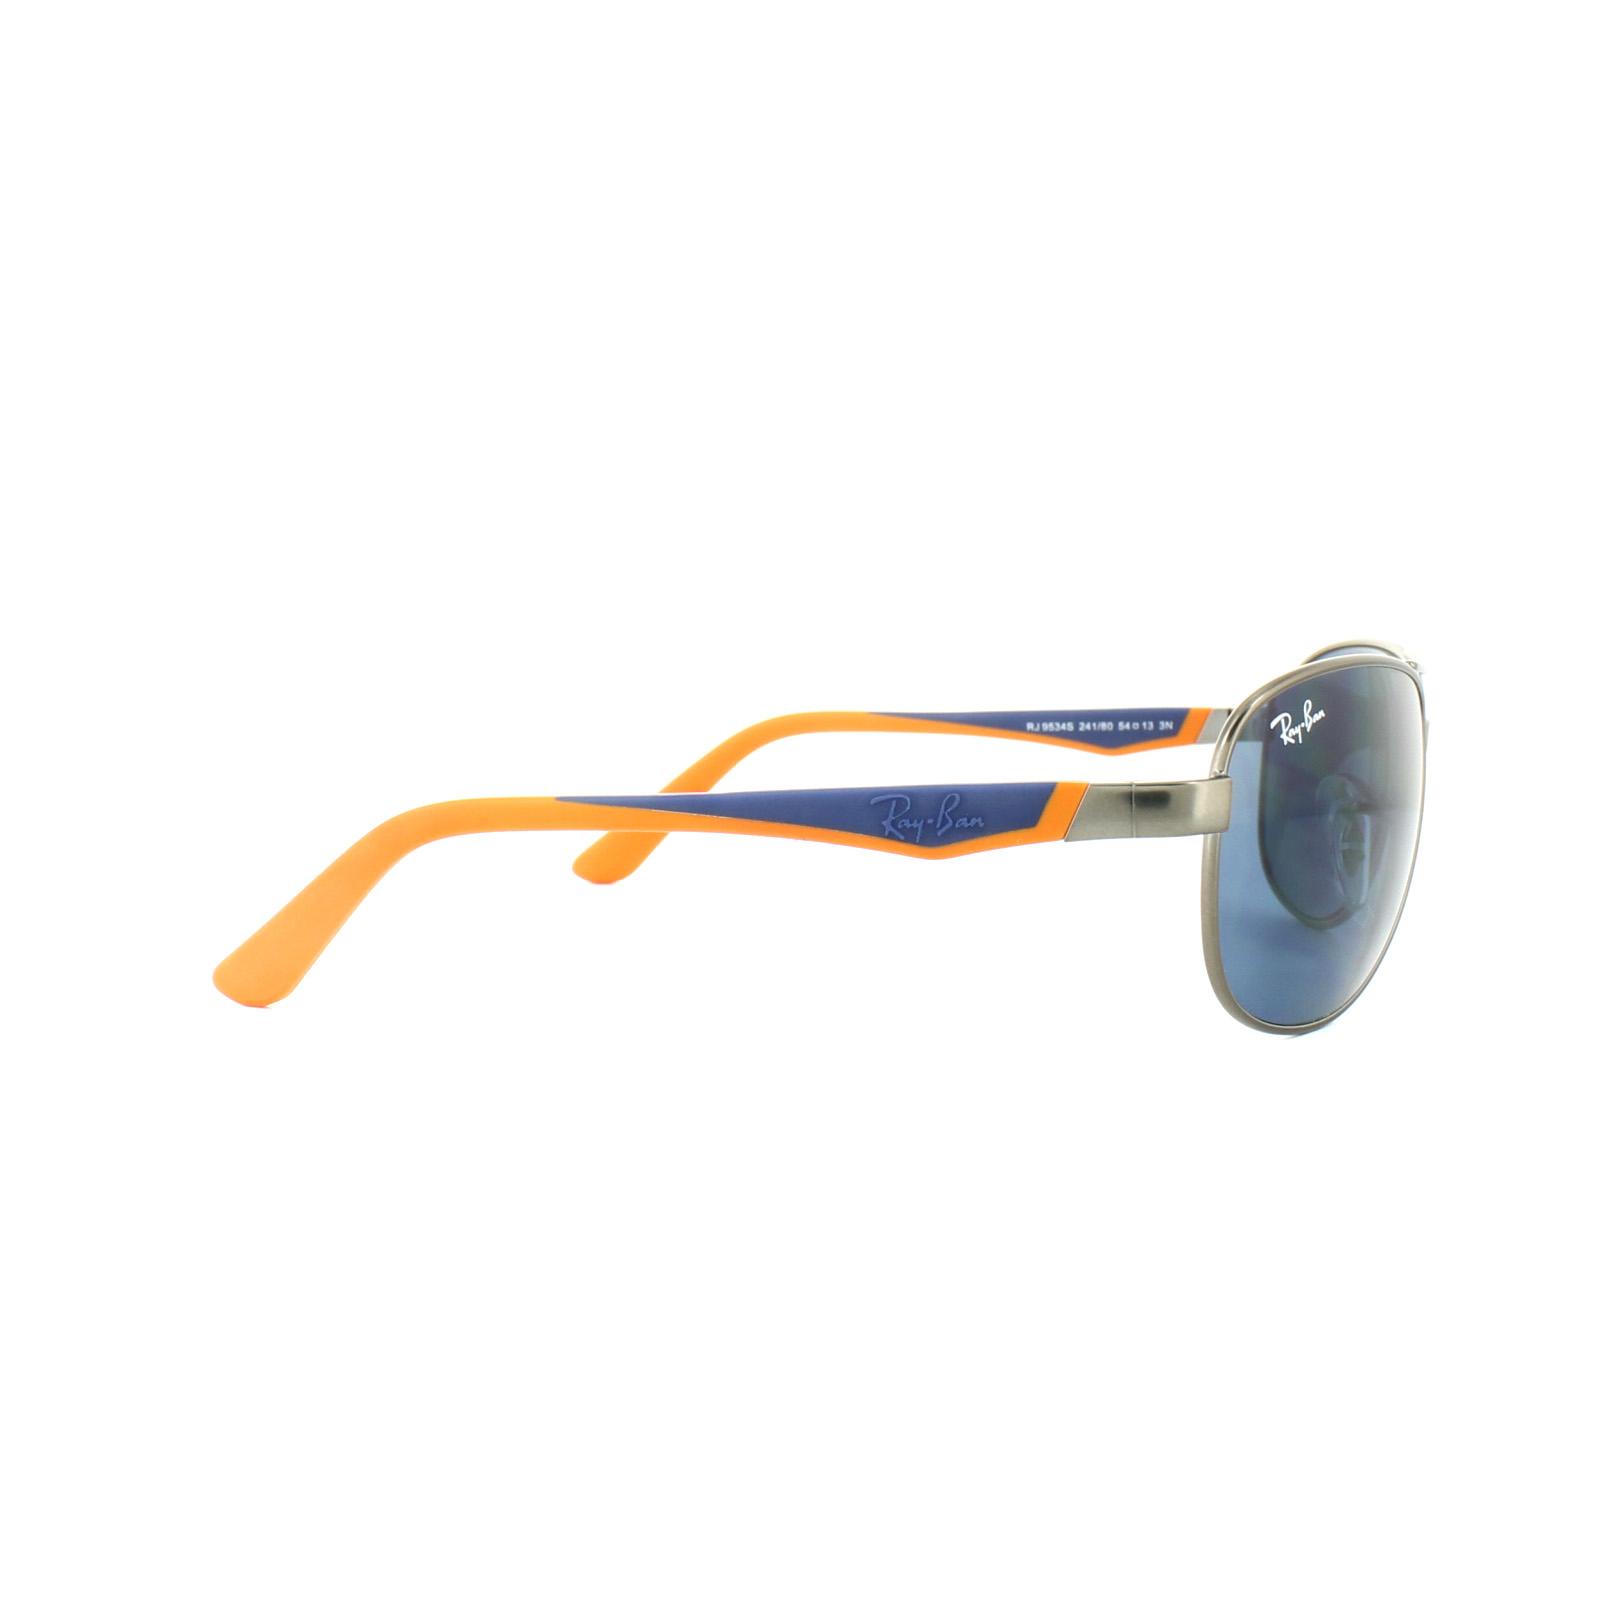 7e37838e530 Sentinel Ray-Ban Junior Sunglasses 9534S 241 80 Gunmetal Blue Orange Blue